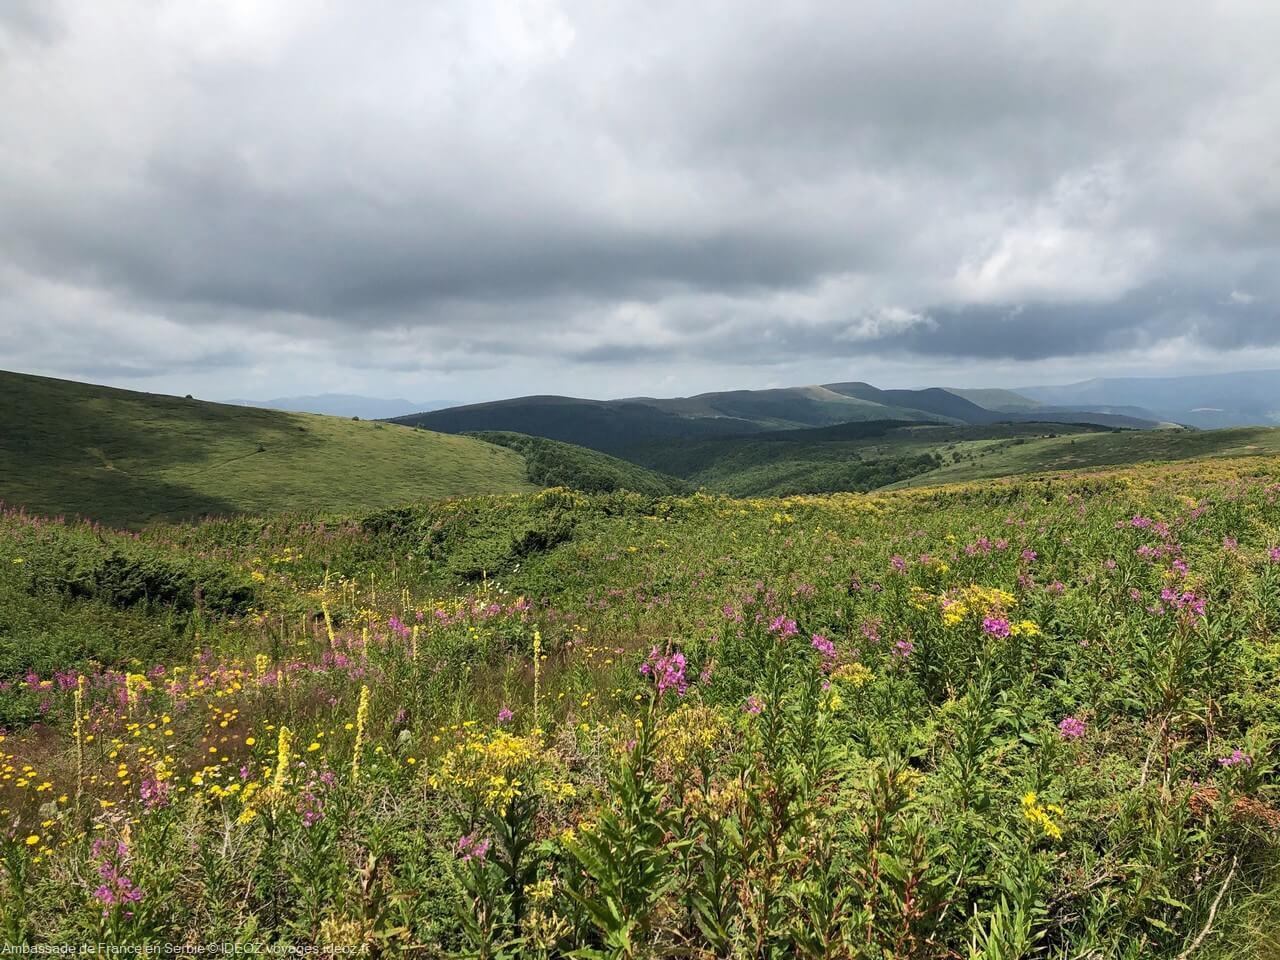 Randonnée à Stara Planina, sur la via dinarica voie verte en Serbie 18